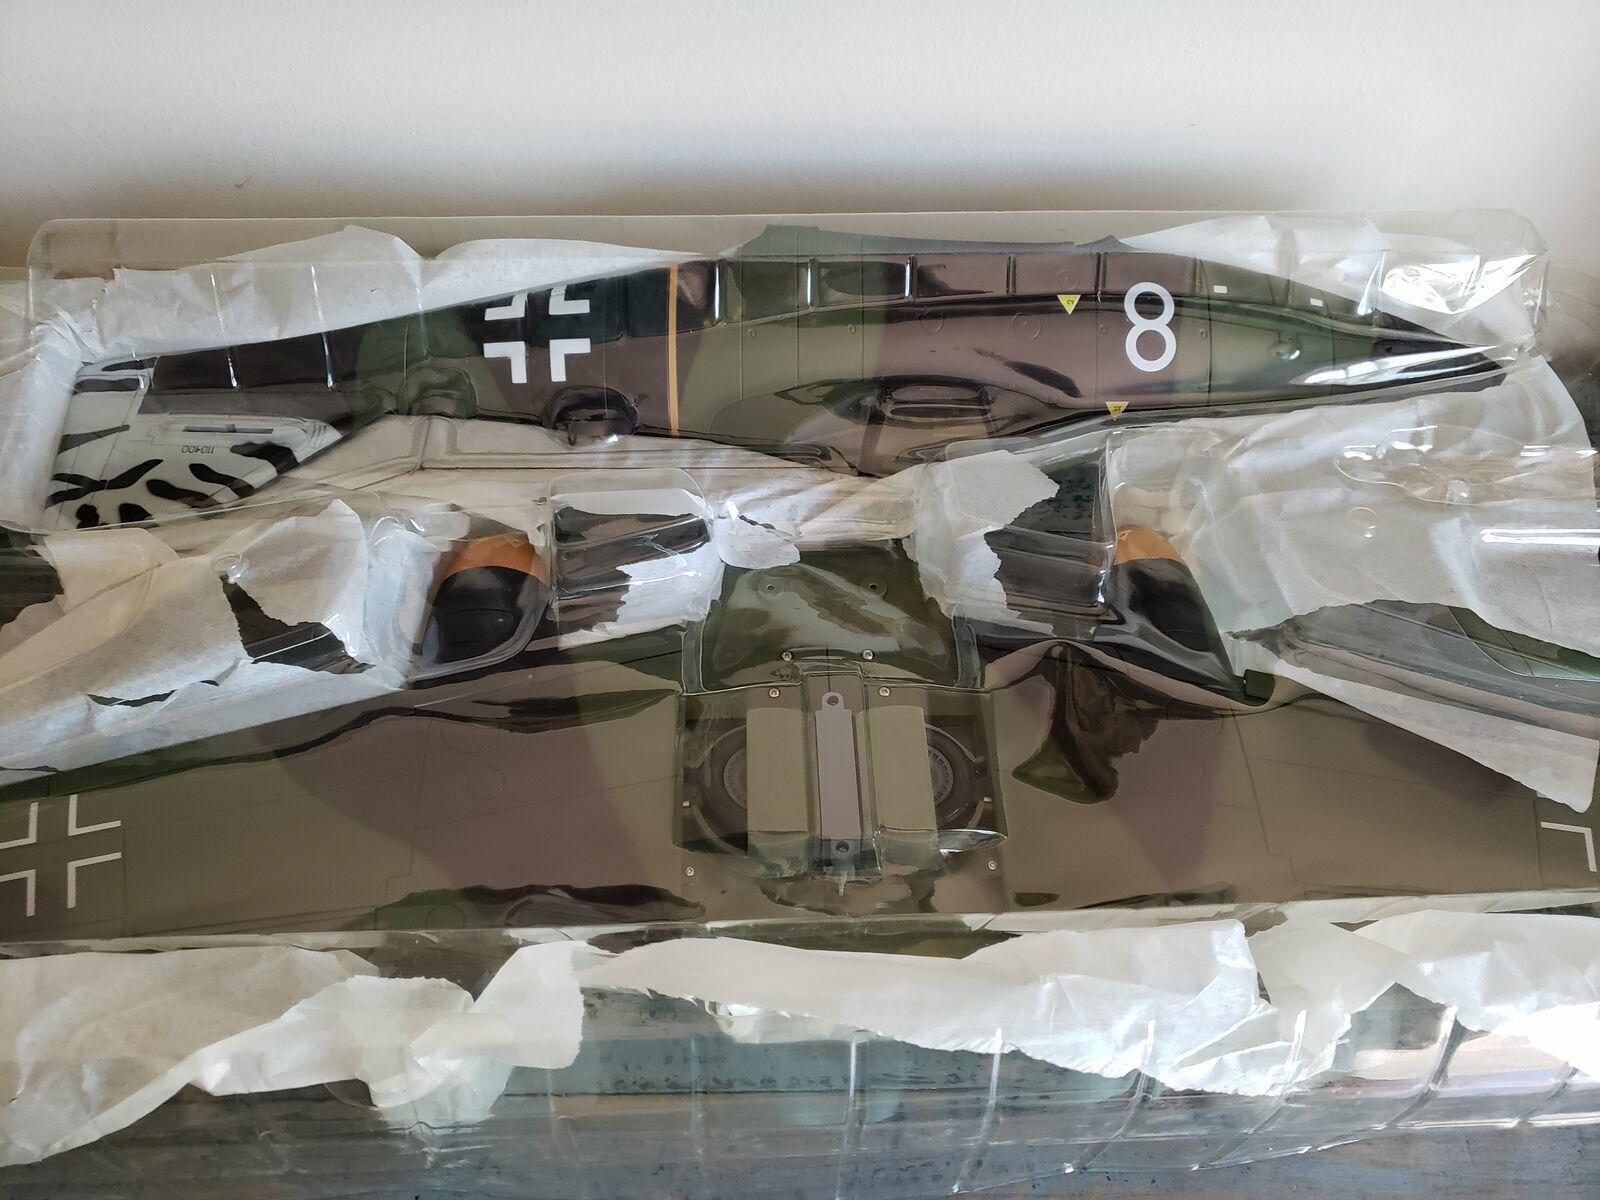 NUOVO 118 AMMIRAGLIO giocattoli WW2 tedesco Messerschmitt ME262A1A FIGHTER BIANCO 8 RARA